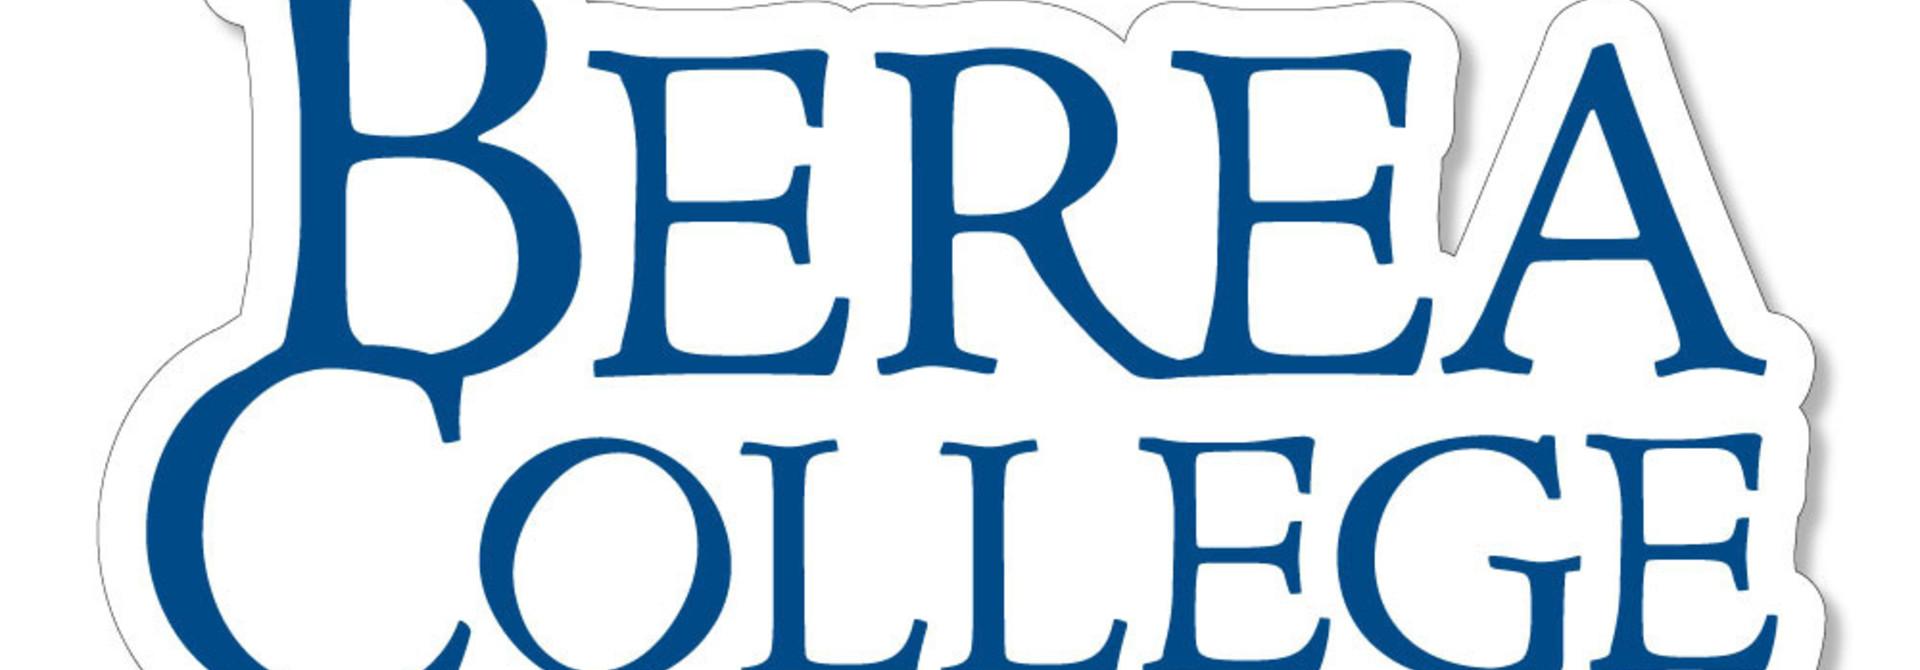 Blue Berea College Stacked Logo Dizzler Sticker